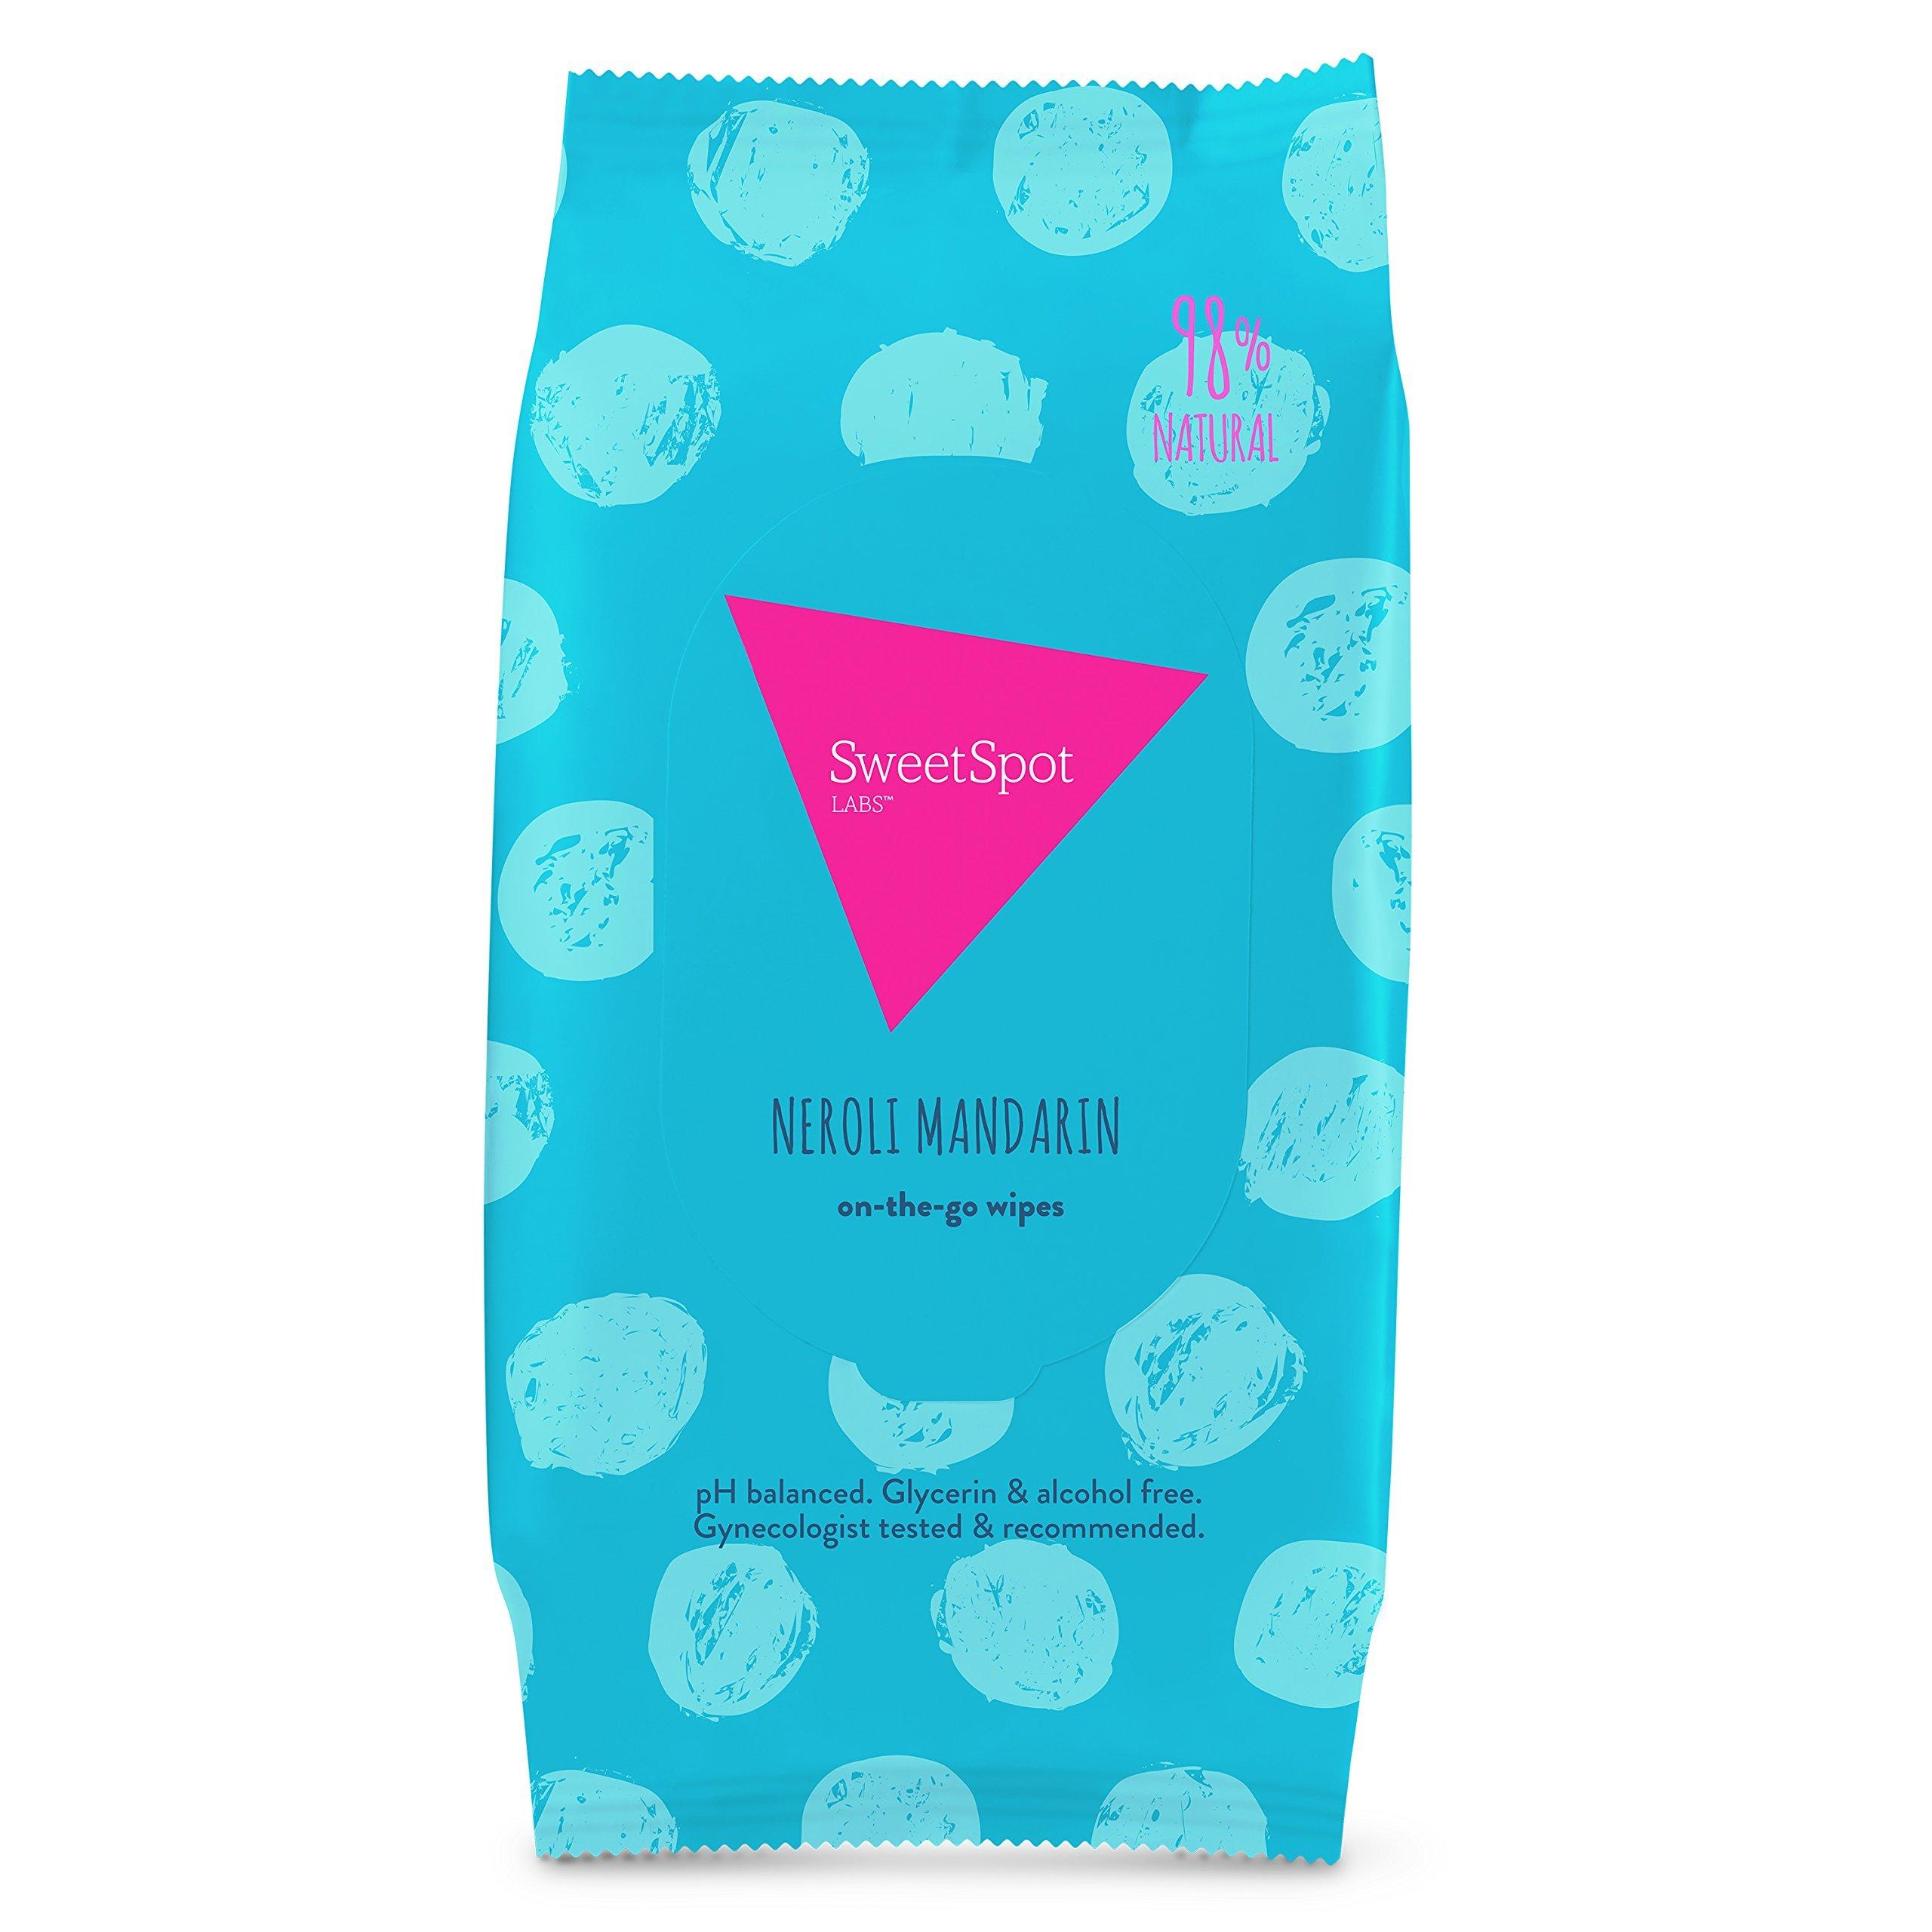 SweetSpot Labs Natural, pH Balanced, Personal Gentle Body Wipes, Neroli Mandarin, 30